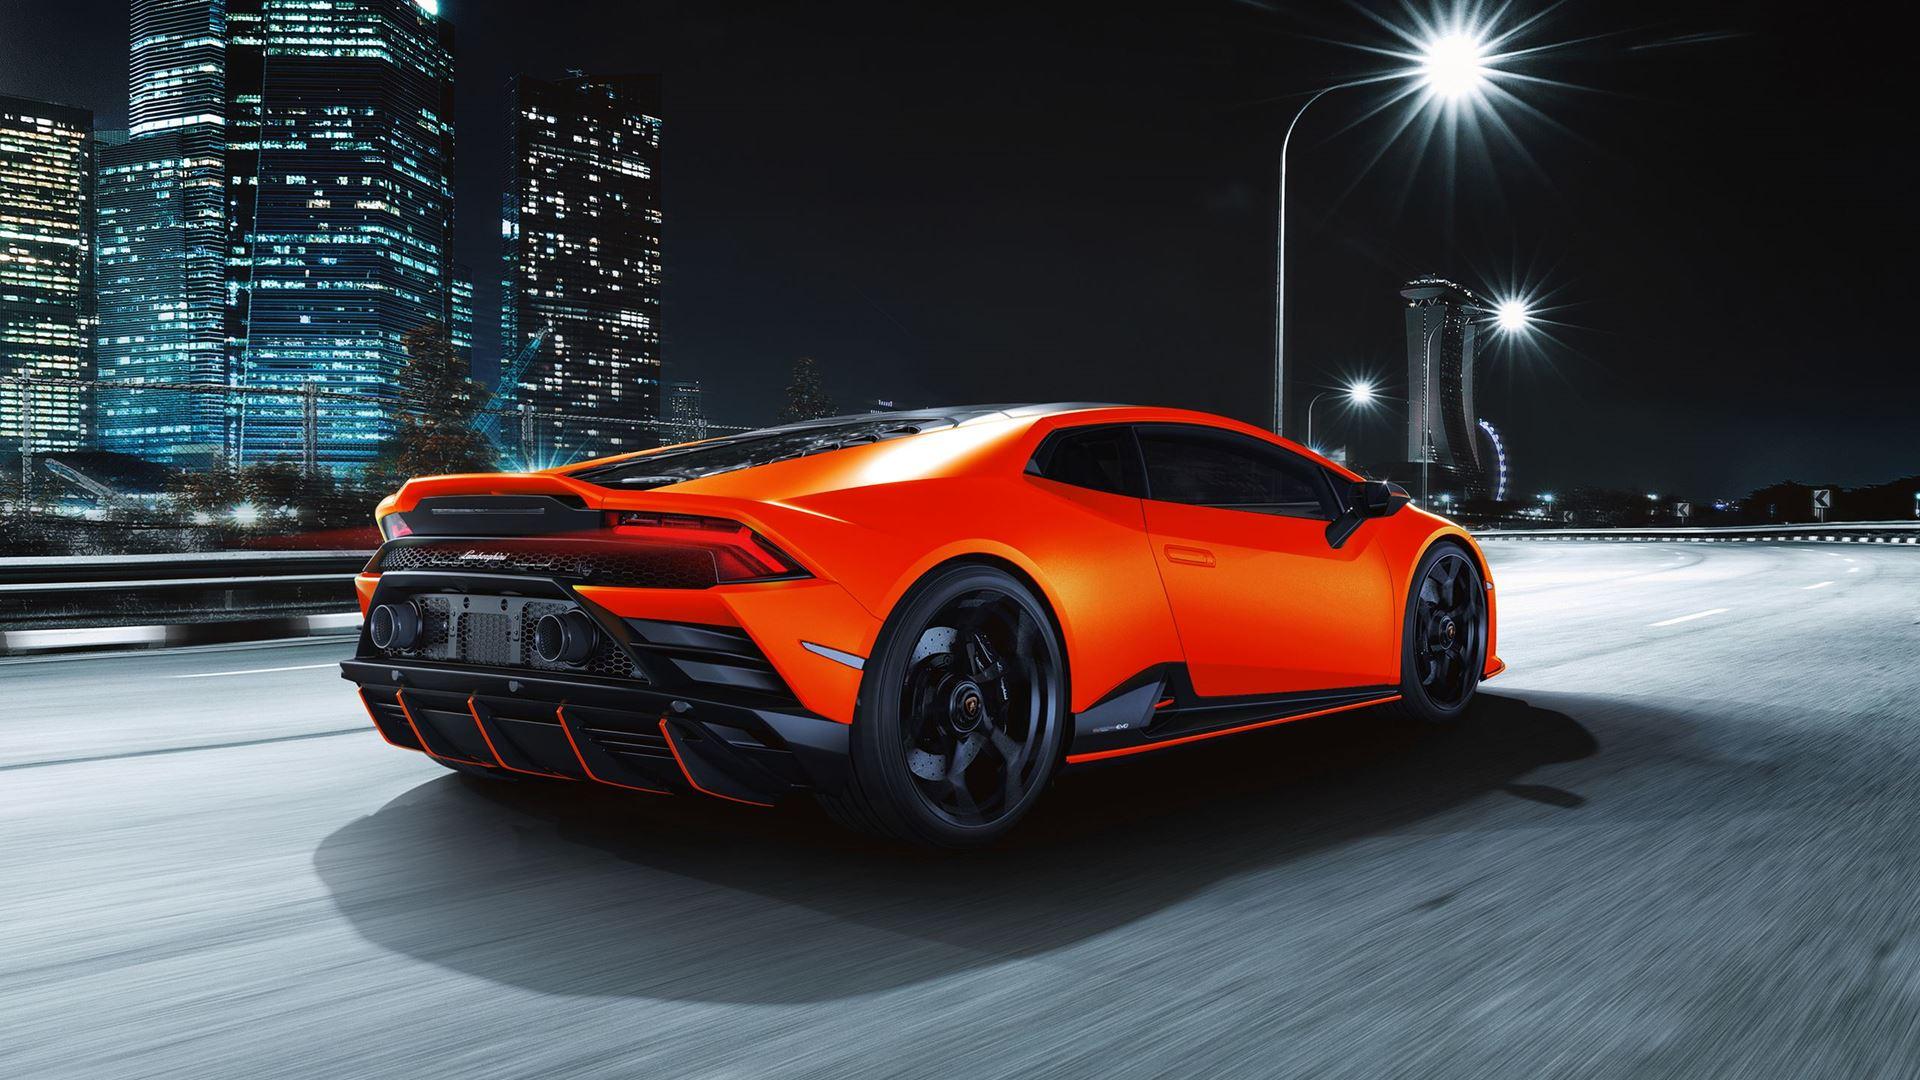 Daring elegance: Automobili Lamborghini presents the Huracán EVO Fluo Capsule - Image 2